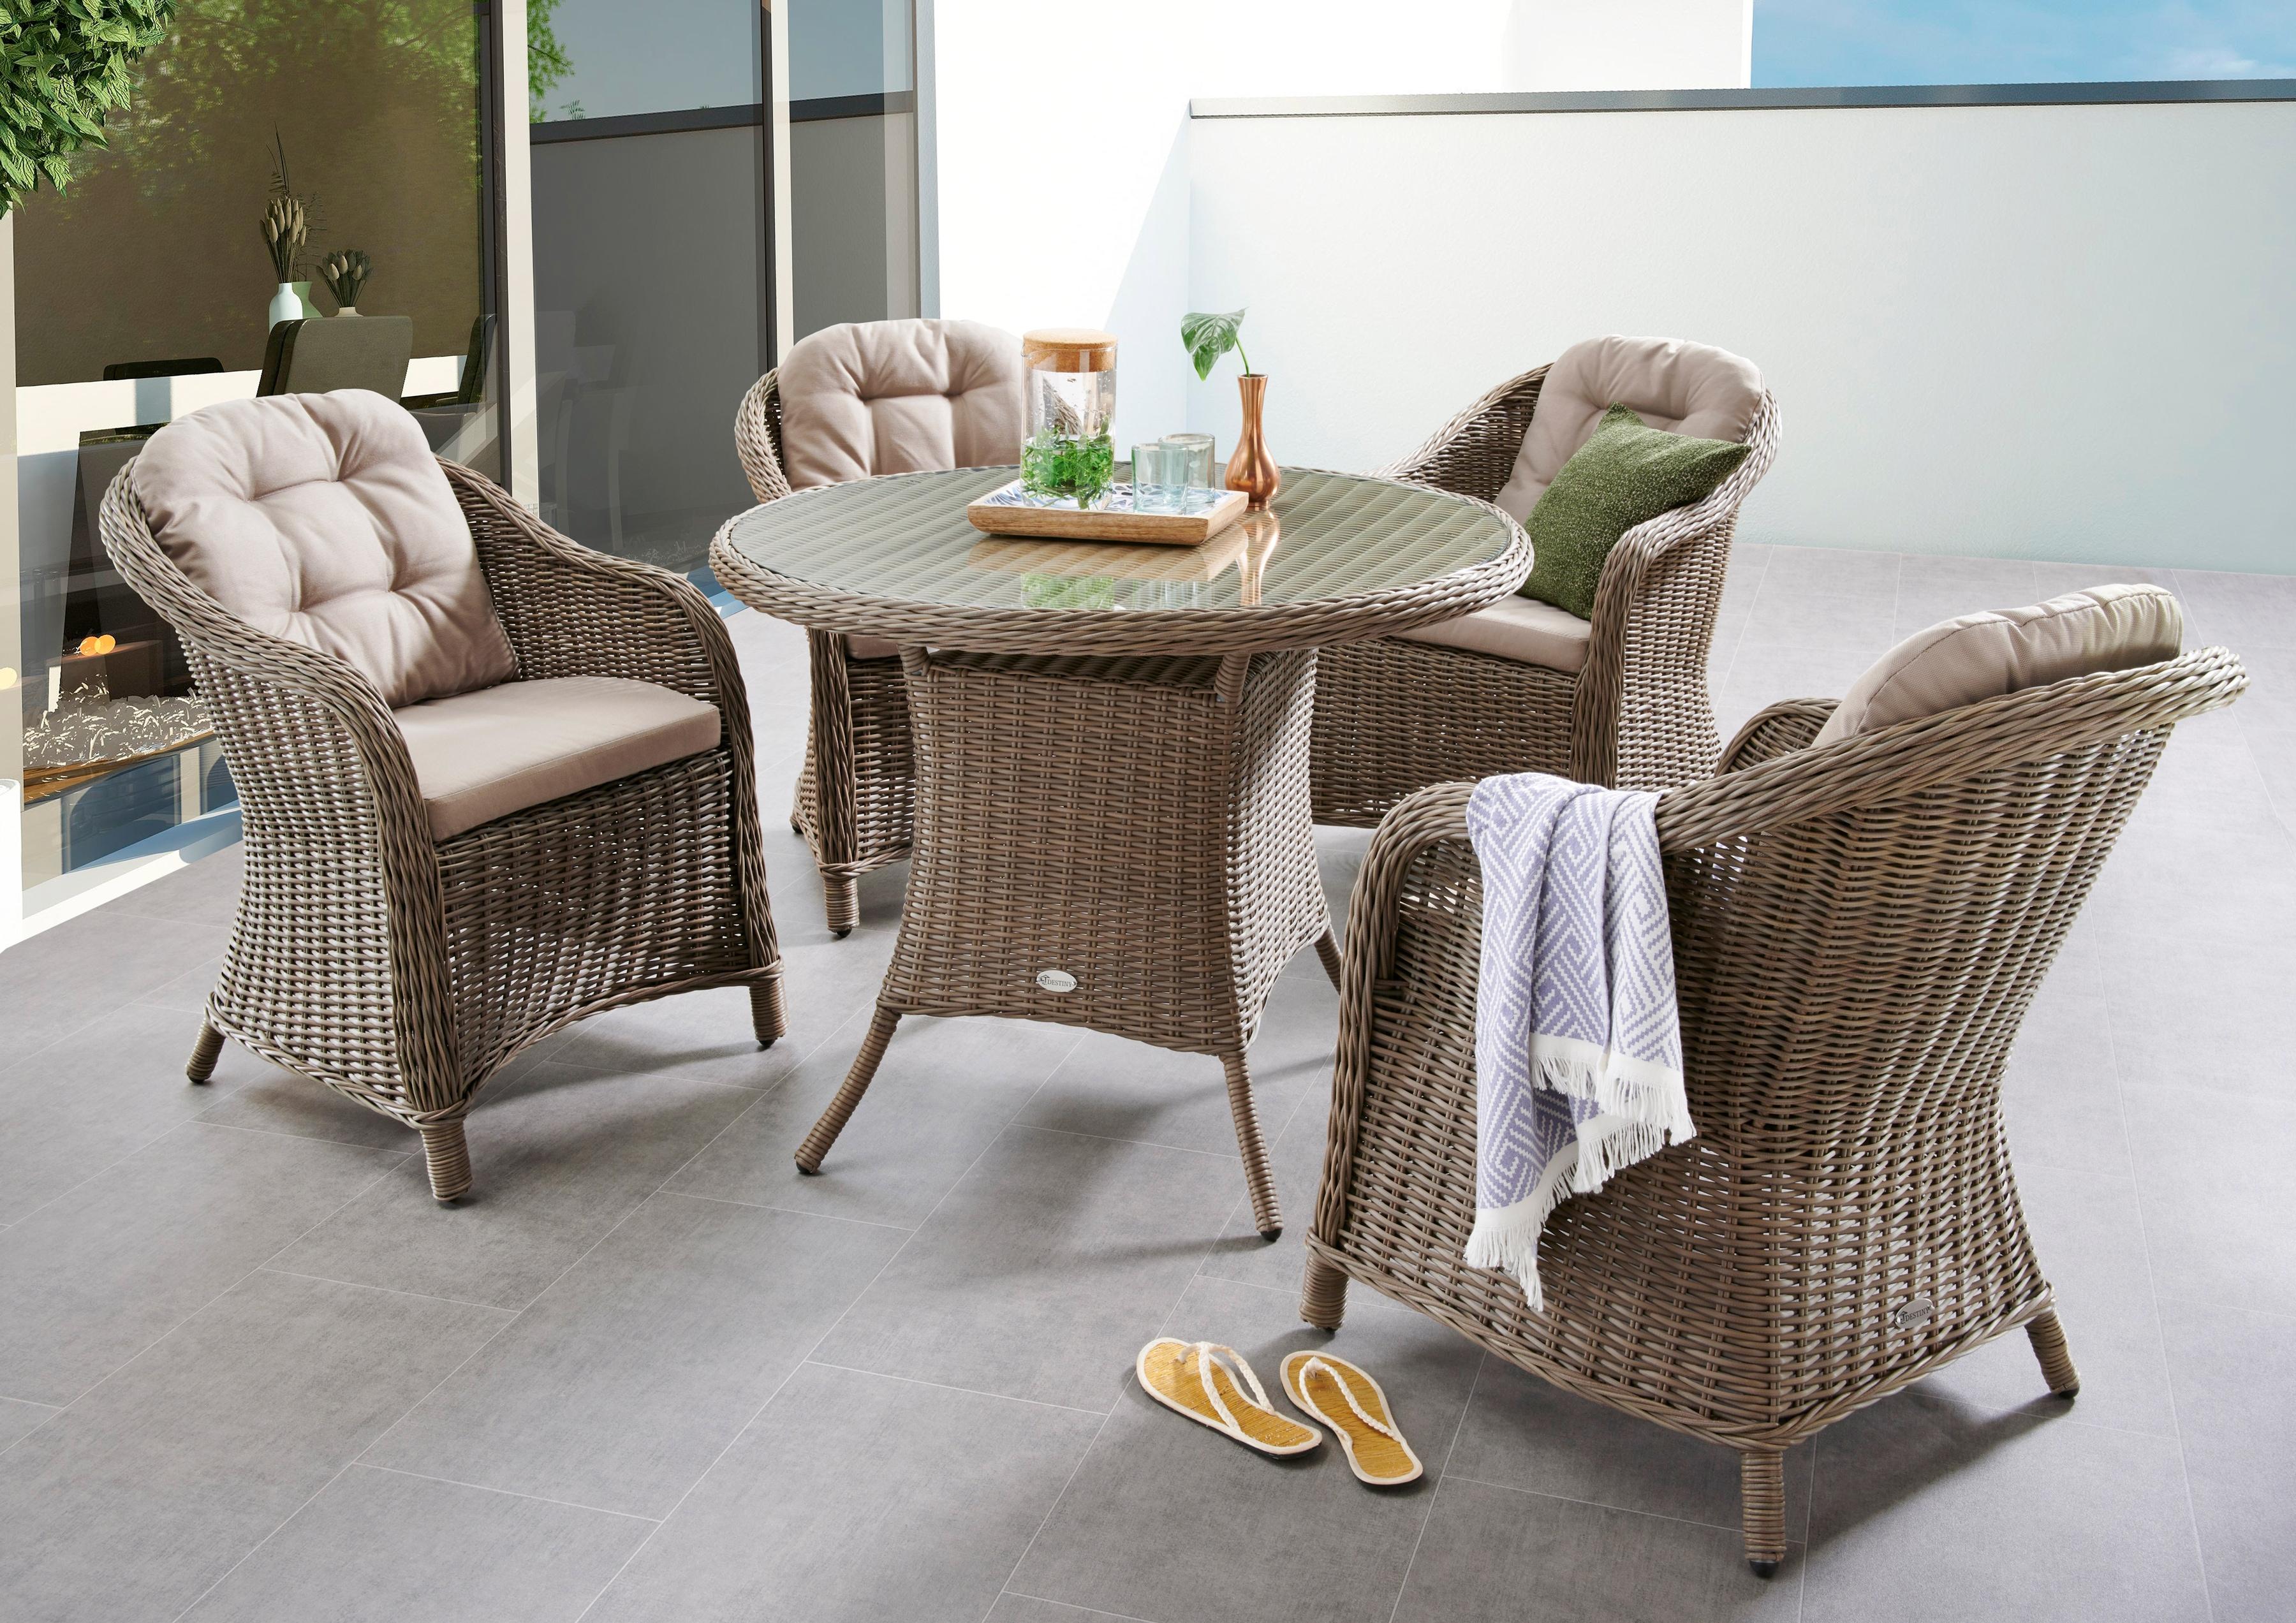 DESTINY Sitzgruppe Key West 5-tlg 4 Sessel Tisch 100 cm Alu/Polyrattan